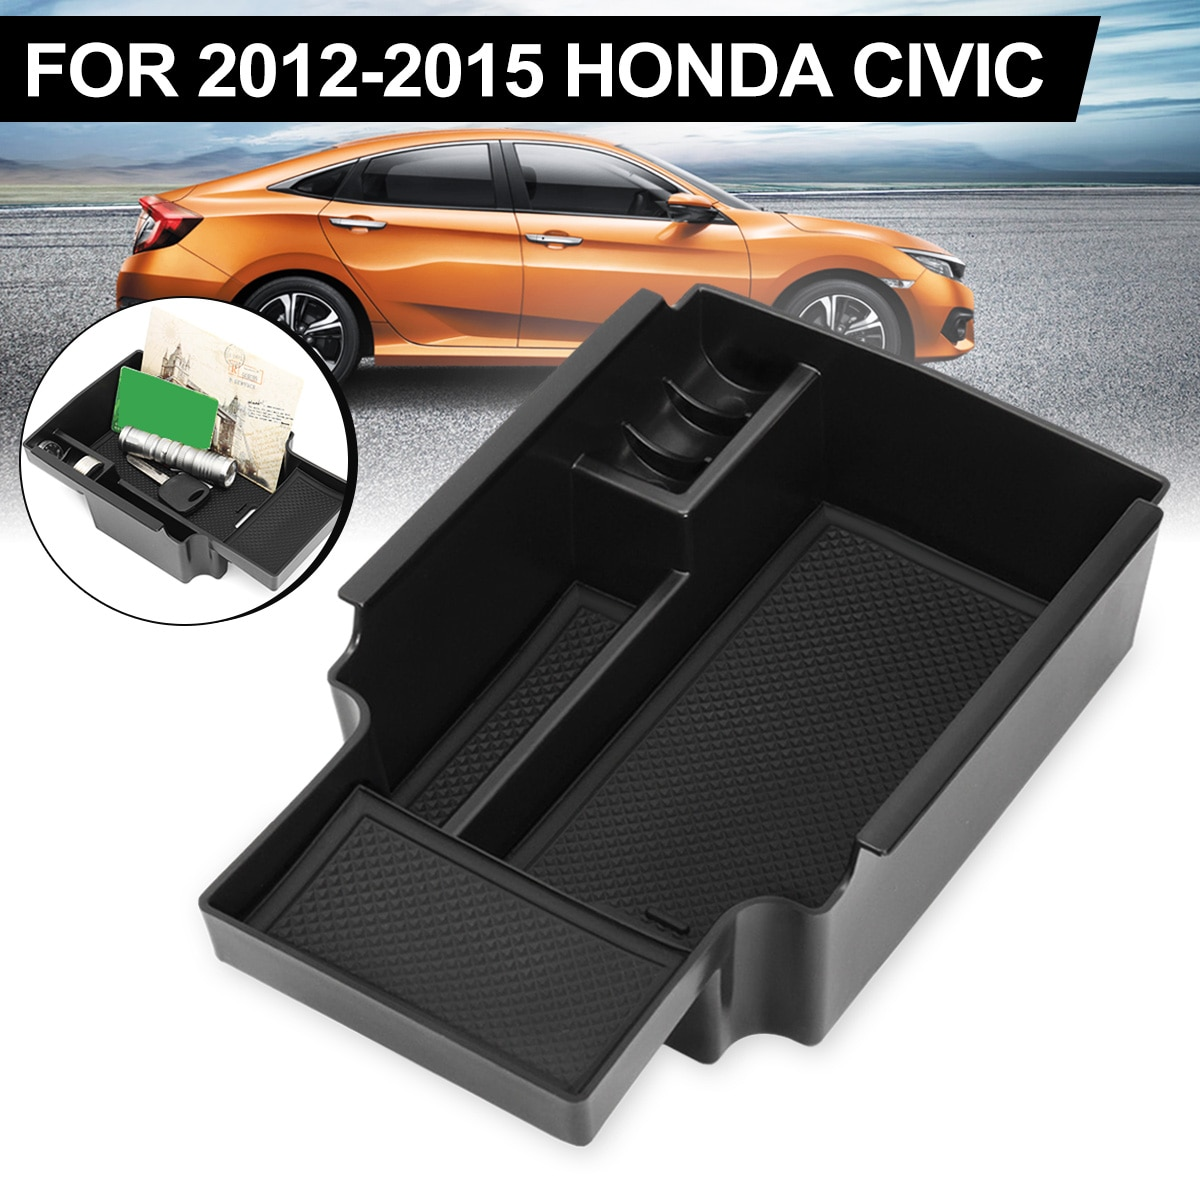 Black Car Center Console Armrest Storage Box Organizer Tray for Honda-Civic 2012 2013 2014 2015 220mmx130mm Car Storage Box